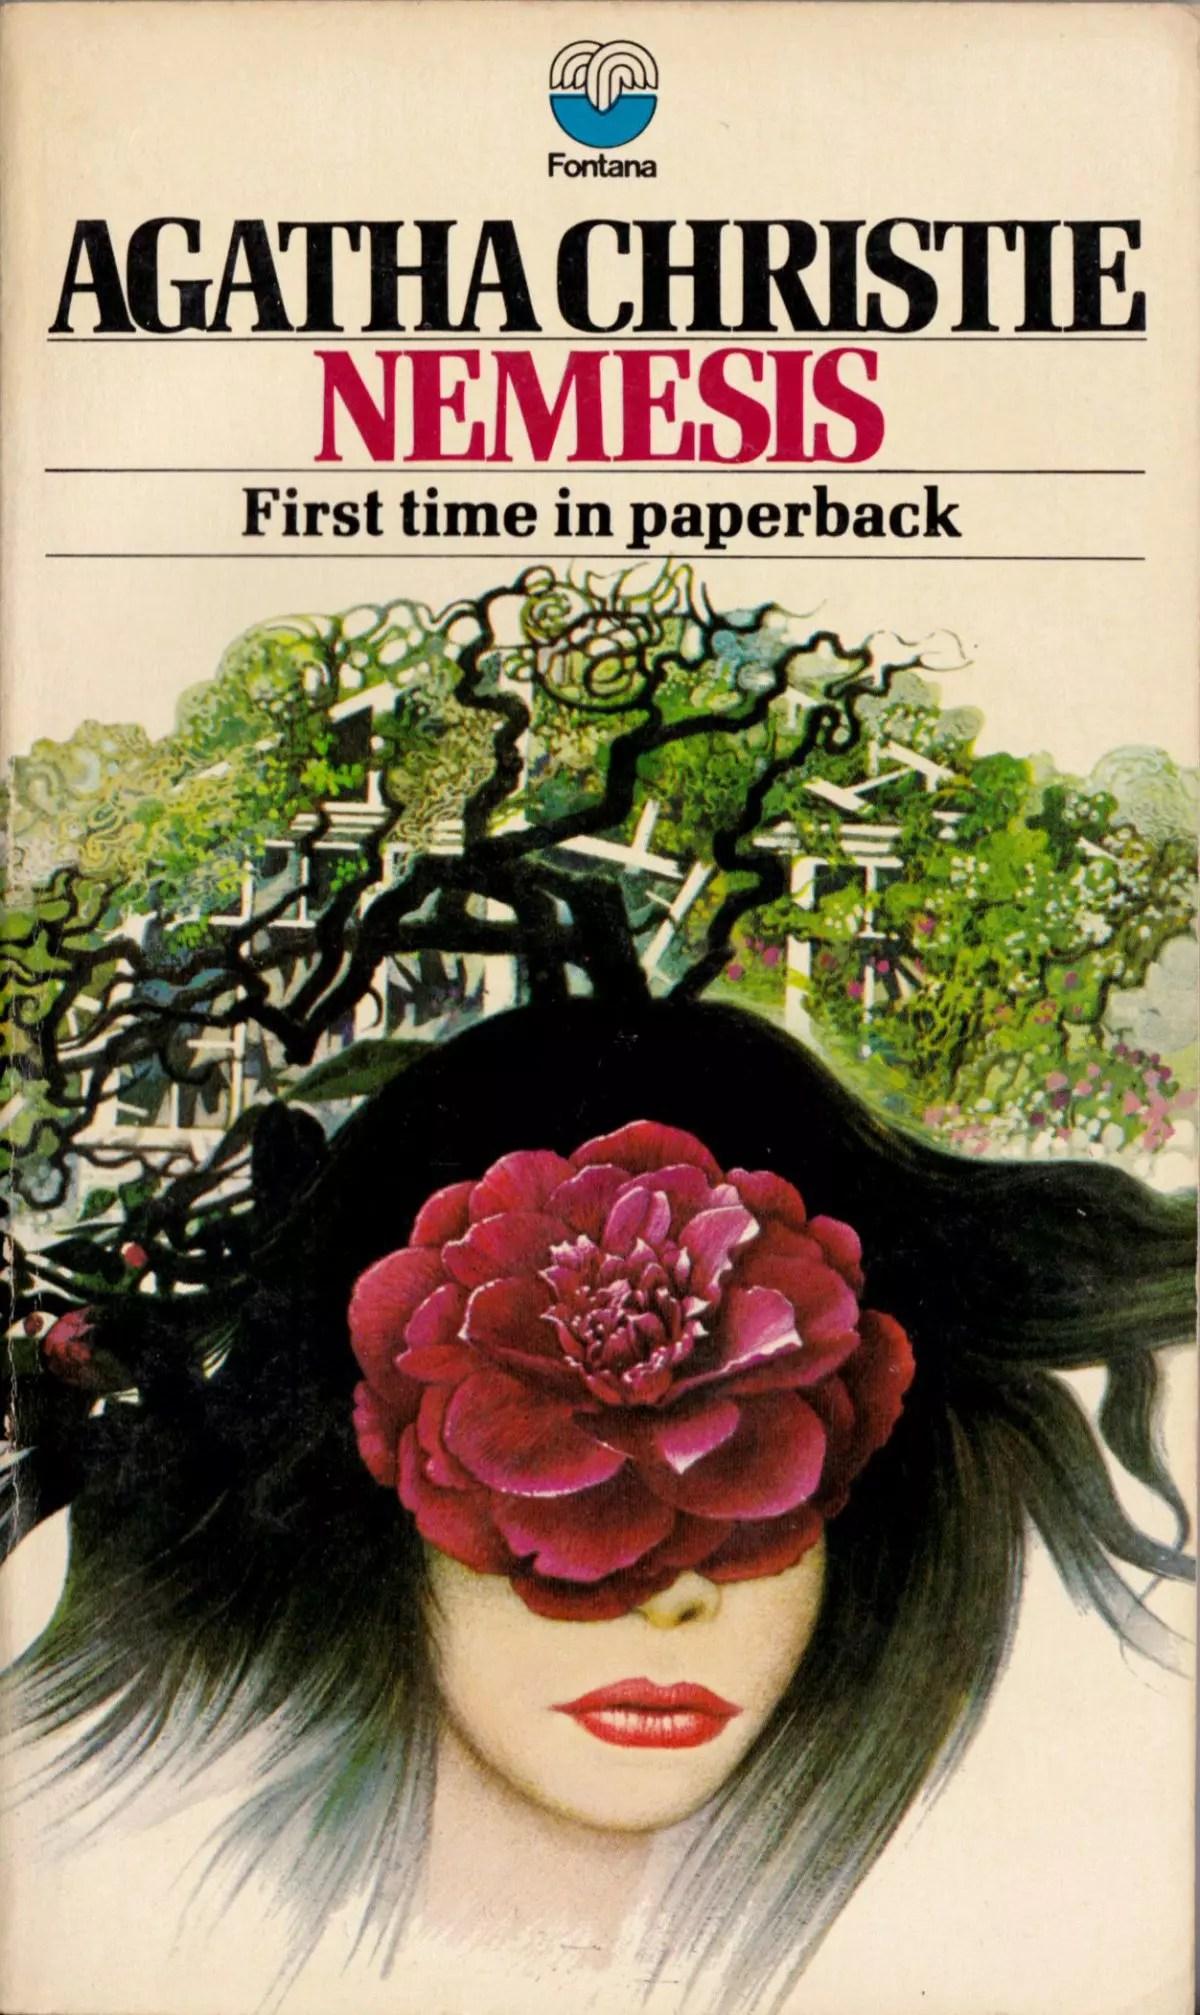 Agatha Christie Tom Adams Nemesis Fontana 1974